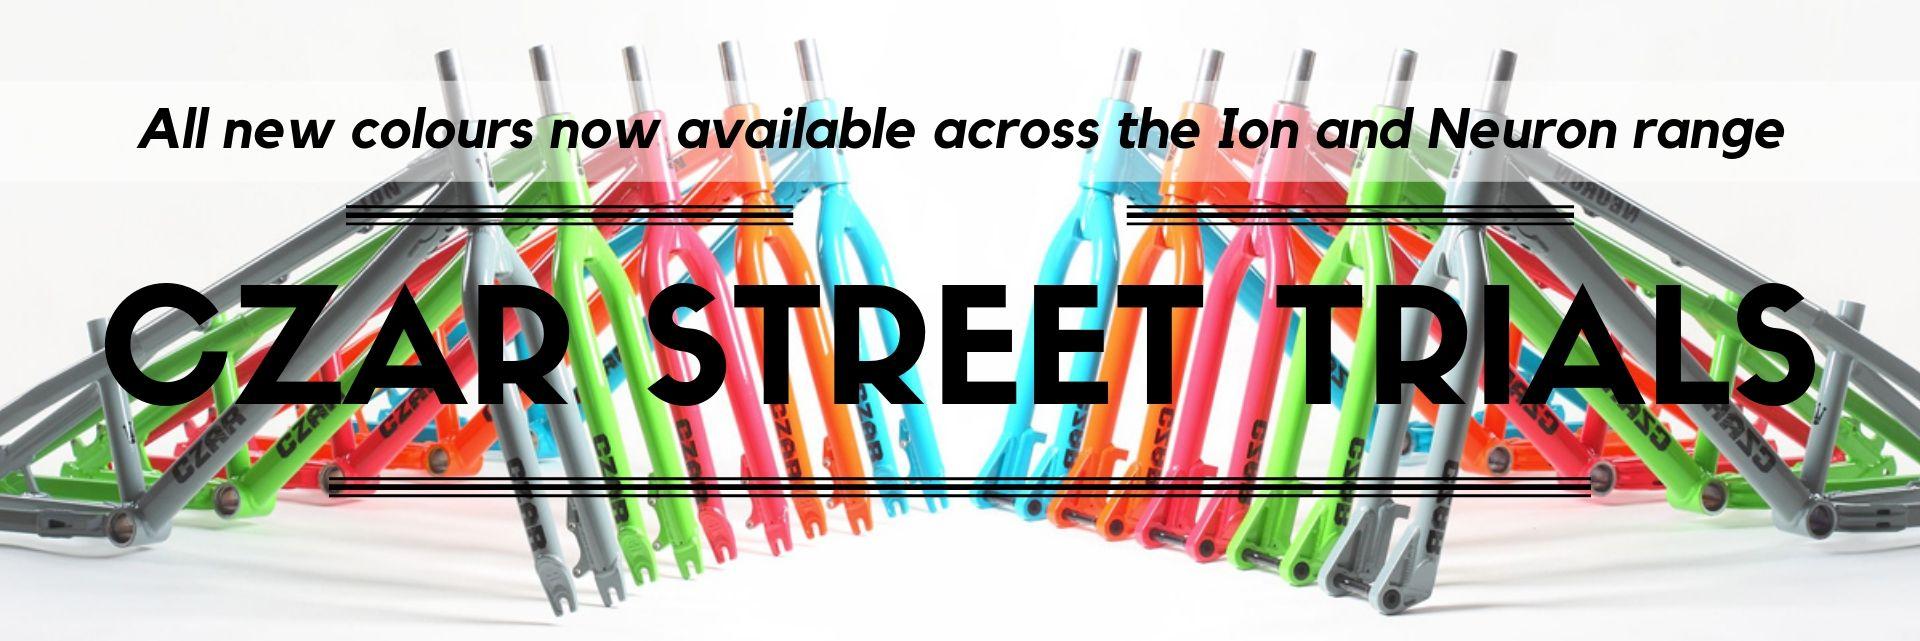 Czar Street Trials Bikes - new colours available